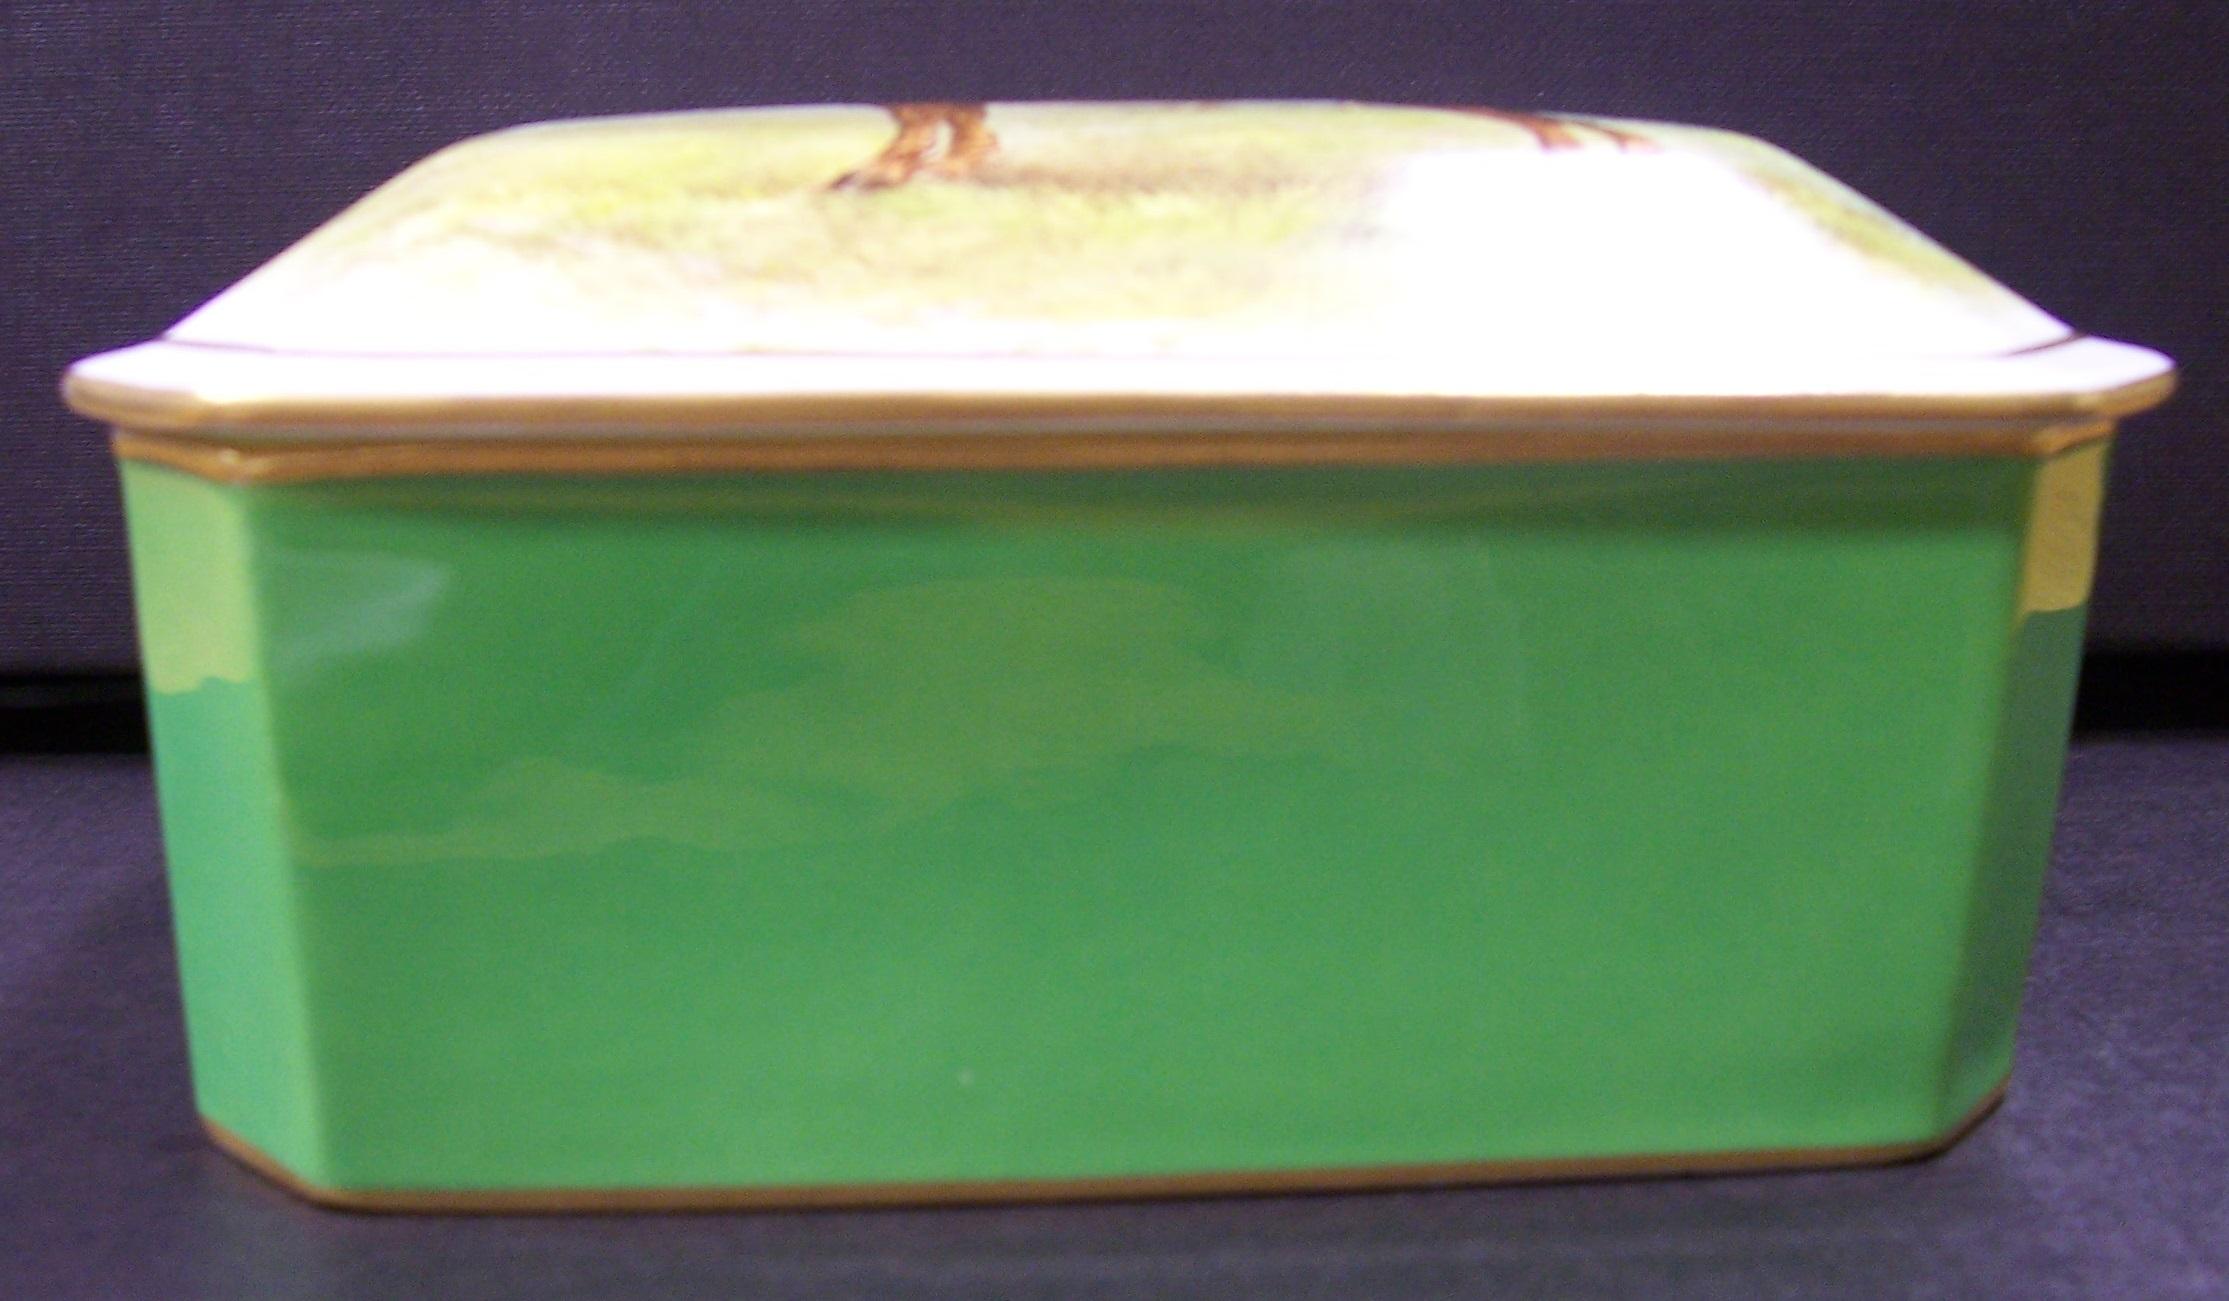 royal-crown-derby-box-1754-shape-gresley-jockey-scene-profile